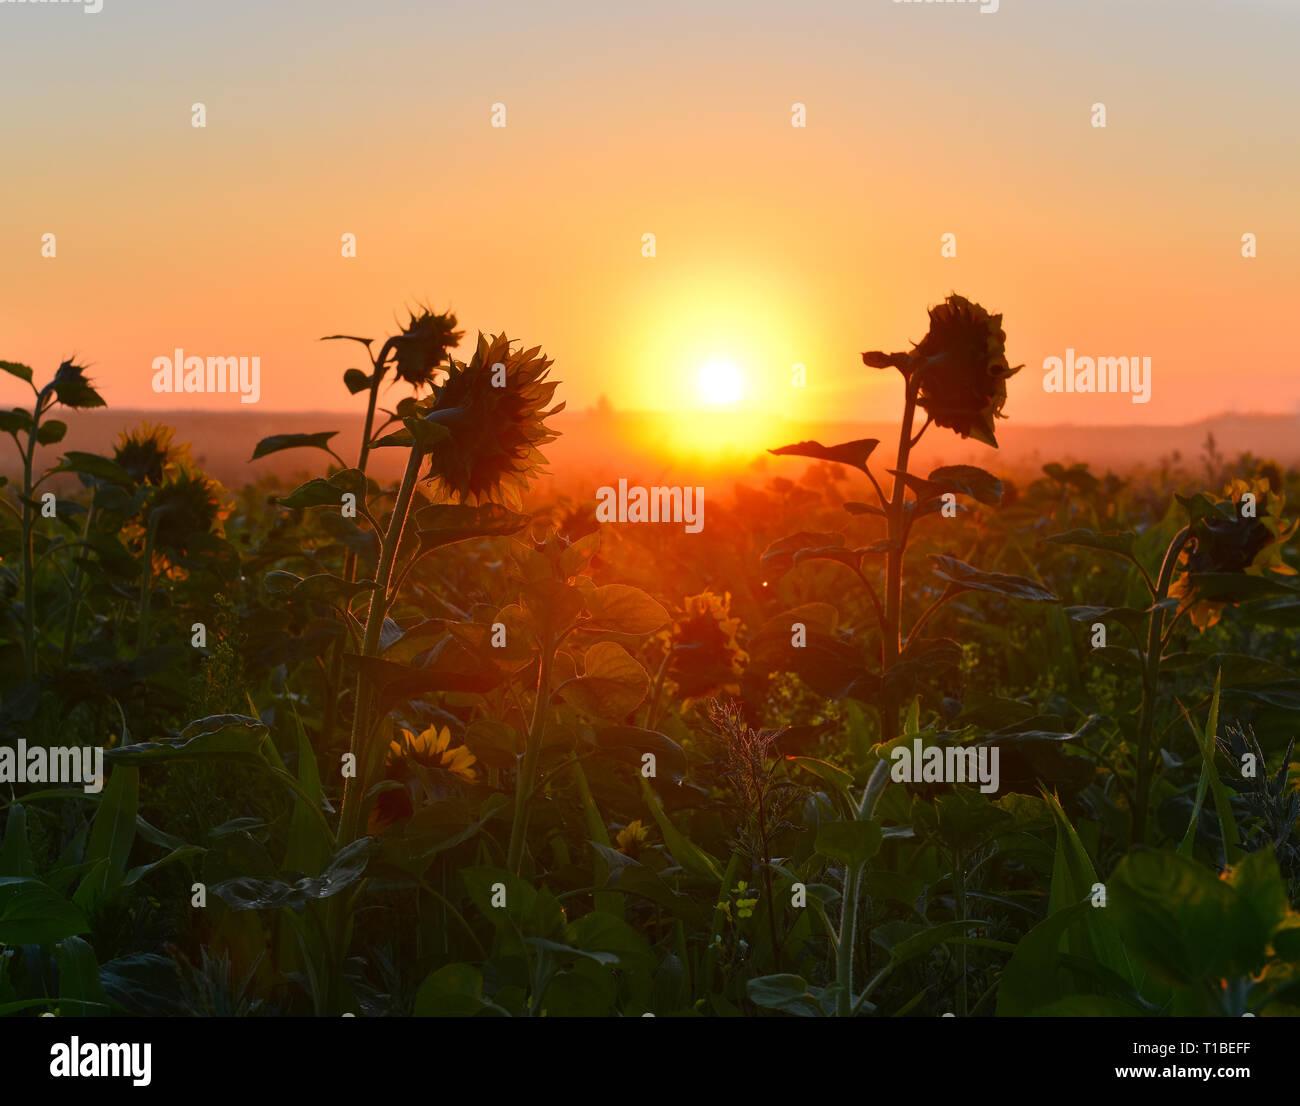 Rising sun above sunflower field - Stock Image